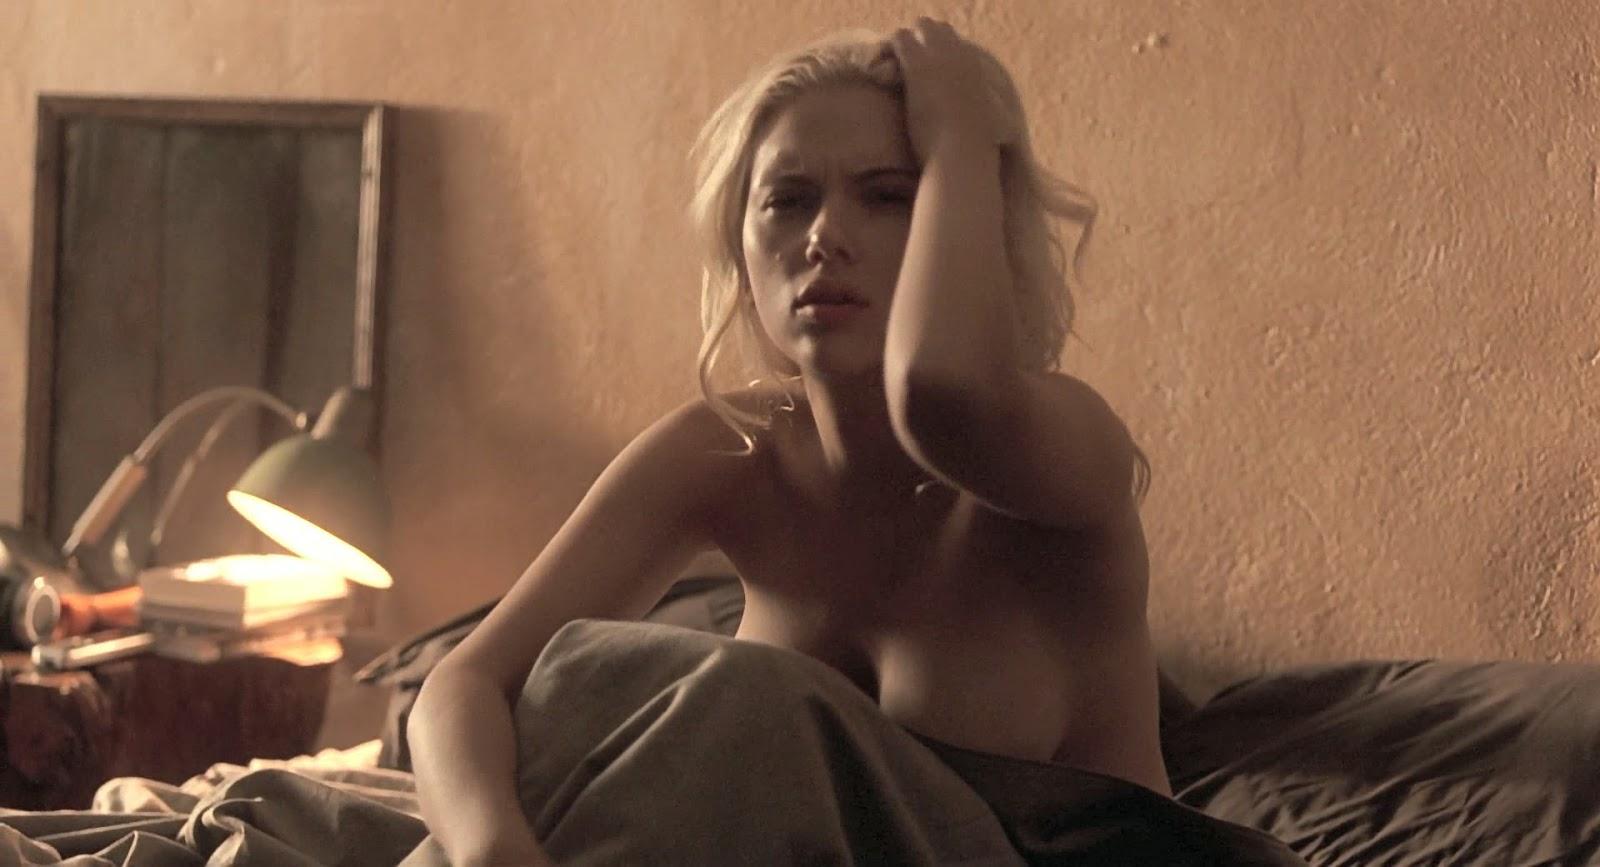 Forbidden dark porn tube nudes photo